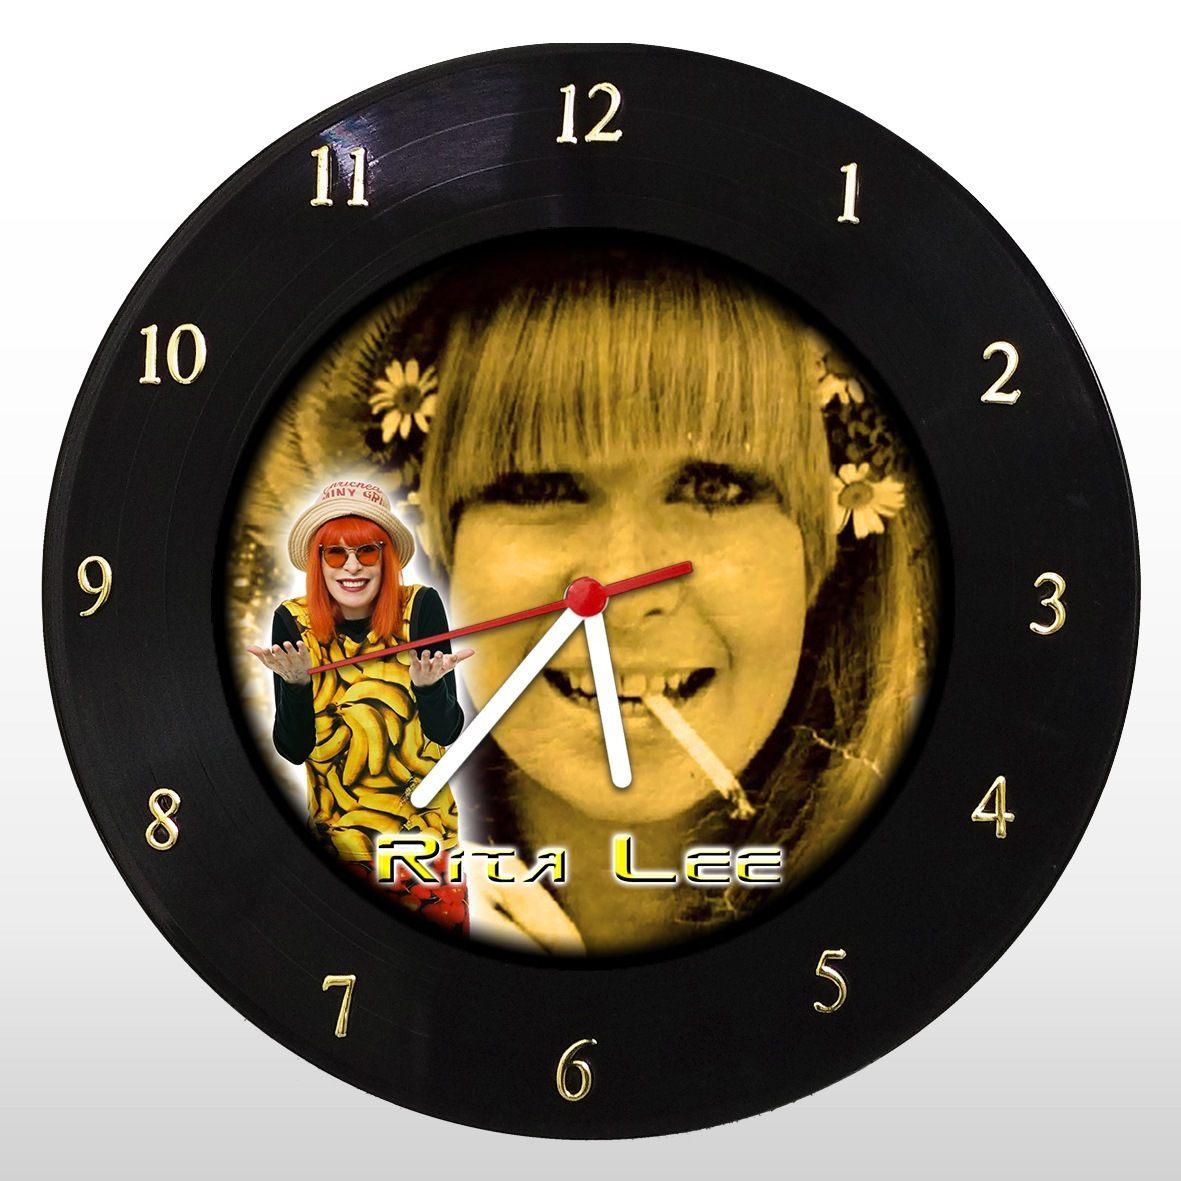 Rita Lee - Relógio de Parede em Disco de Vinil - Mr. Rock